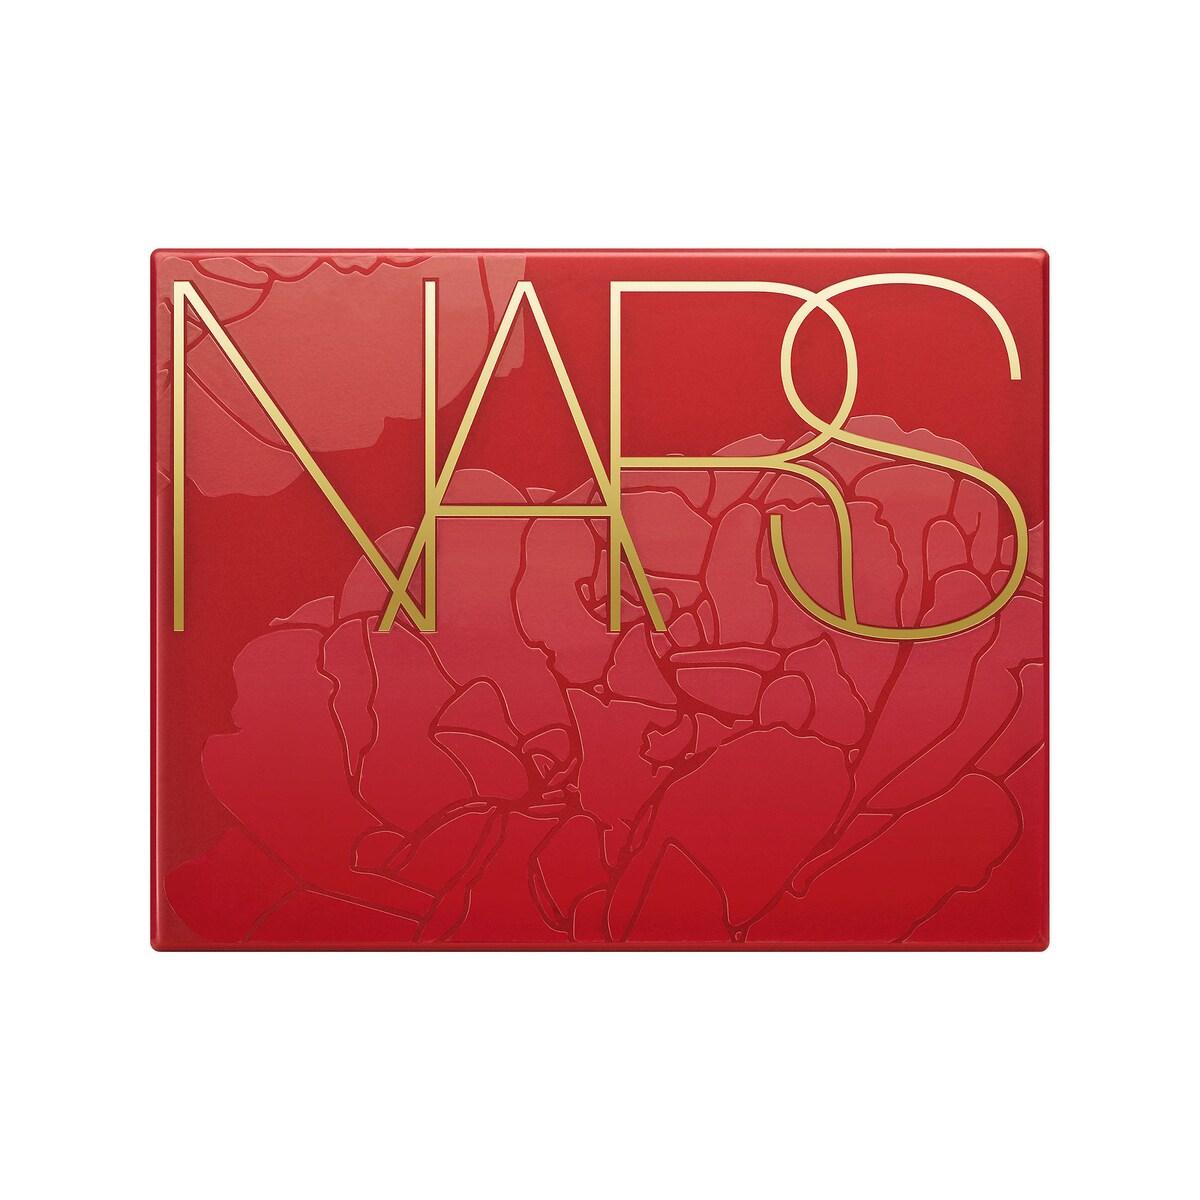 NARS Light Reflecting Setting Powder Holiday 2020 Edition